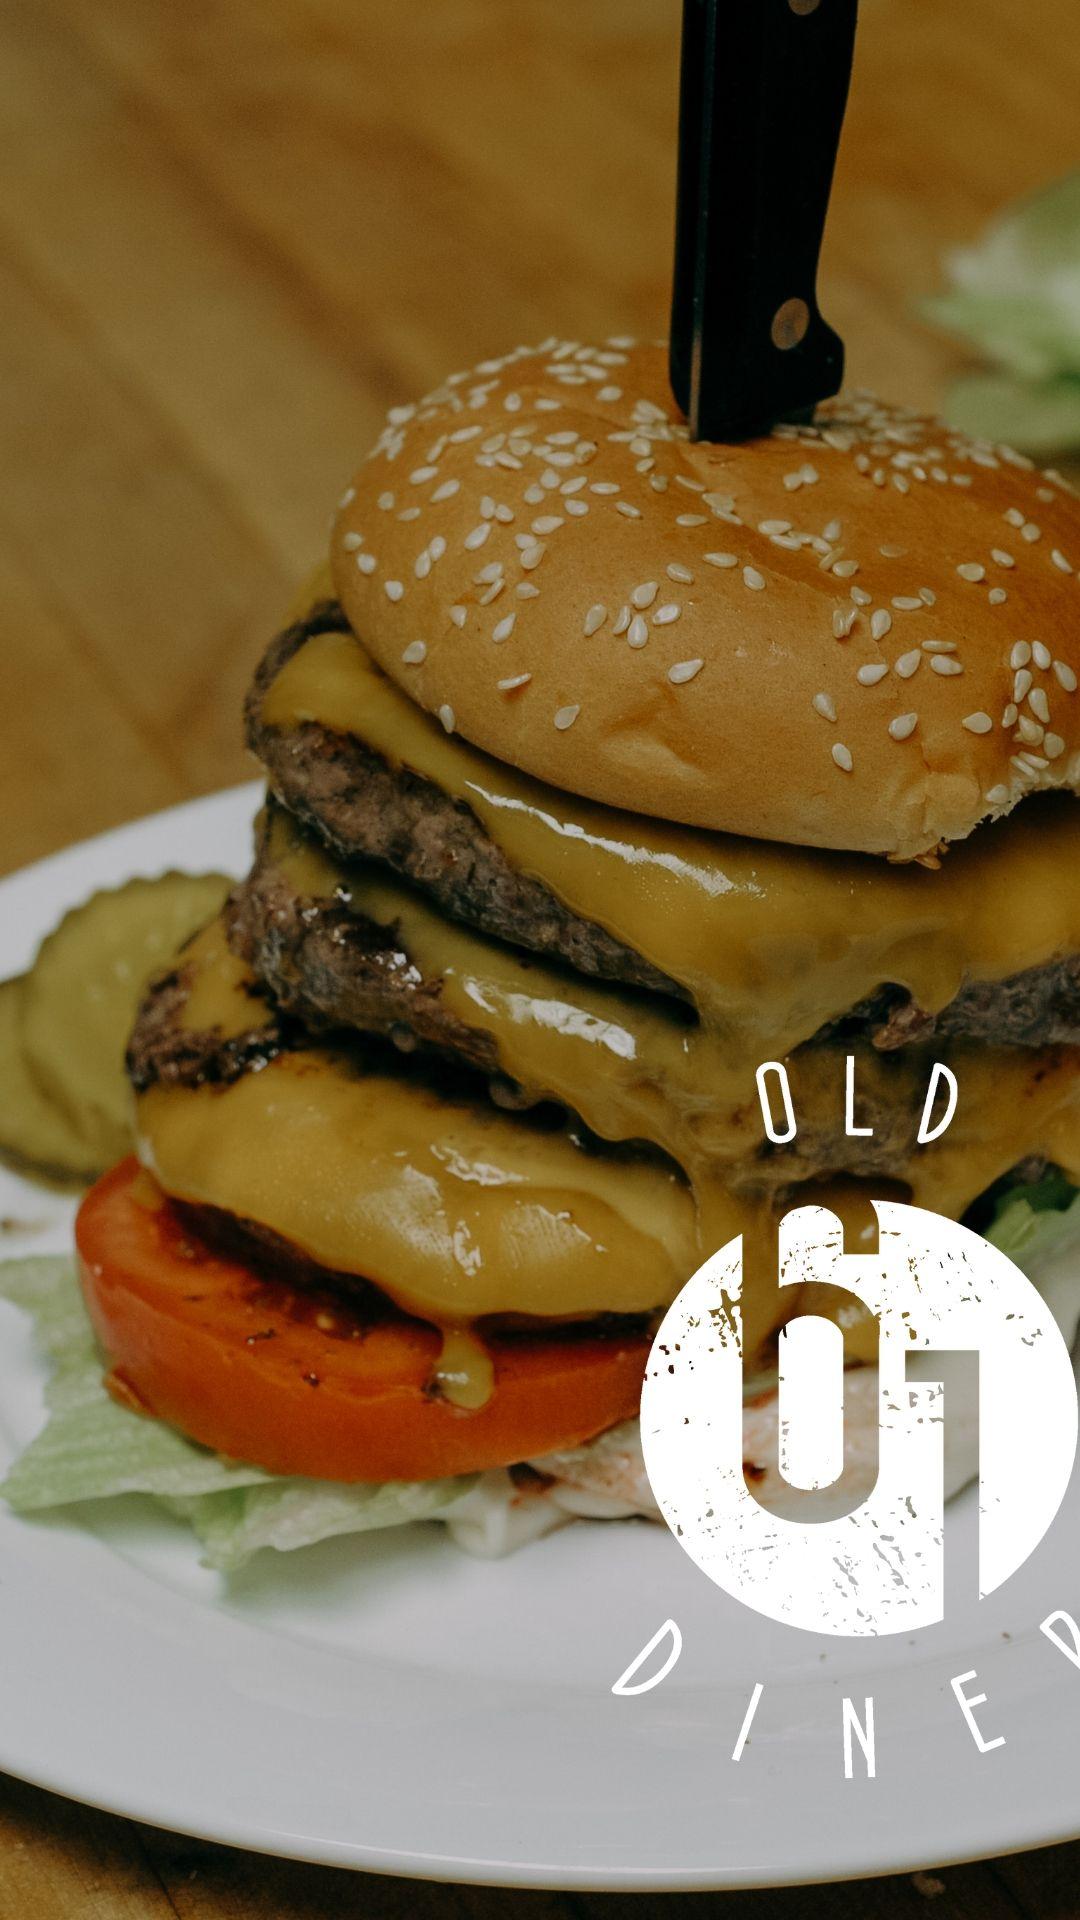 Farm Boy Burger | Old 61 Diner Boscobel WI